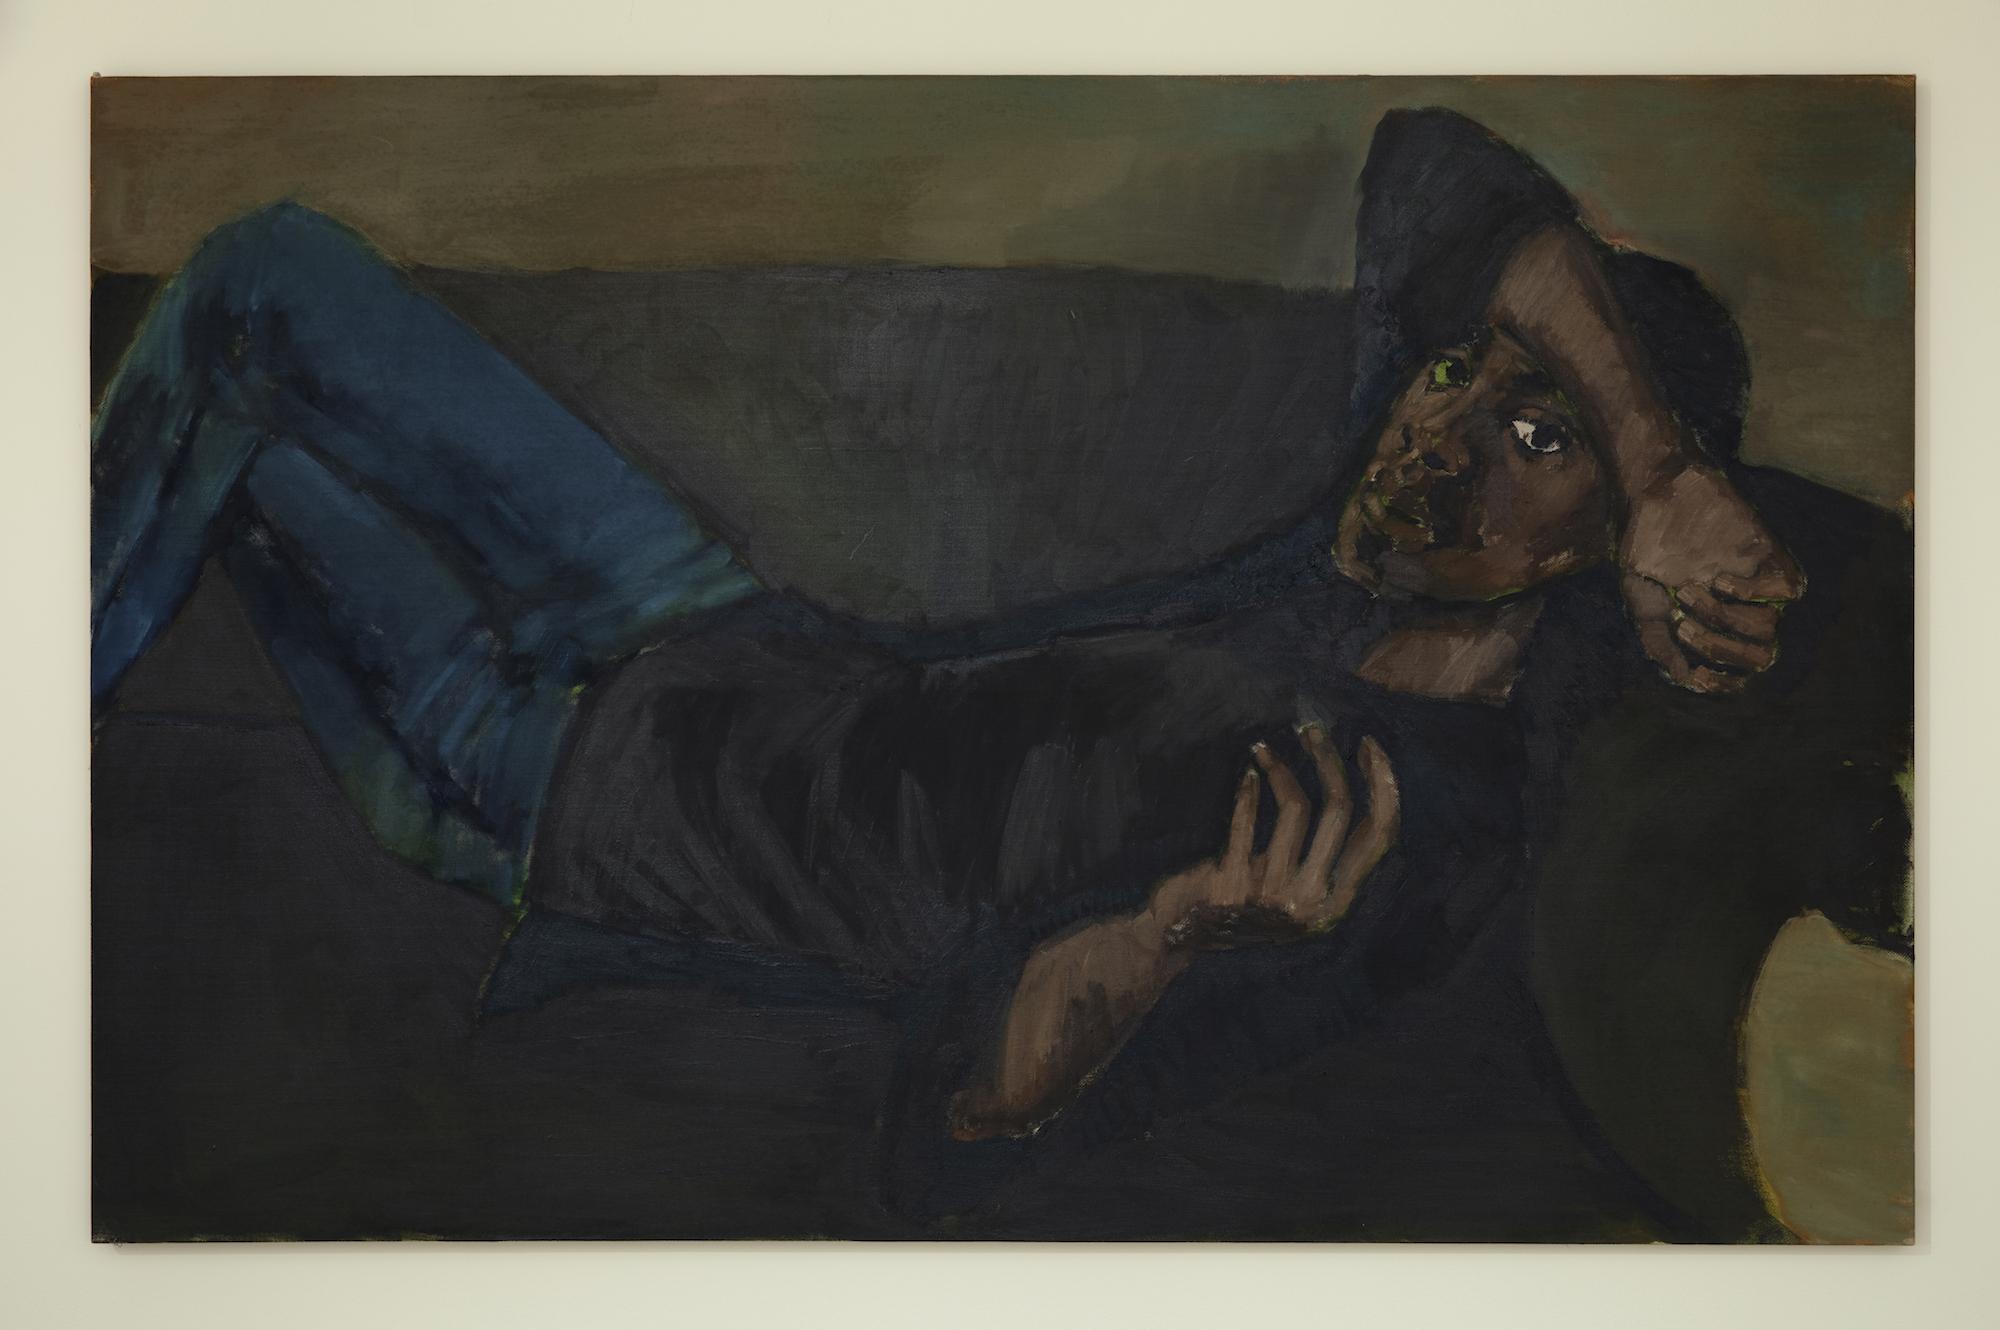 Lynette Yiadom-Boakye, Closer to a Comfort, 2018. © Lynette Yiadom-Boakye. Courtesy of the artist, Jack Shainman Gallery, New York and Corvi-Mora, London.